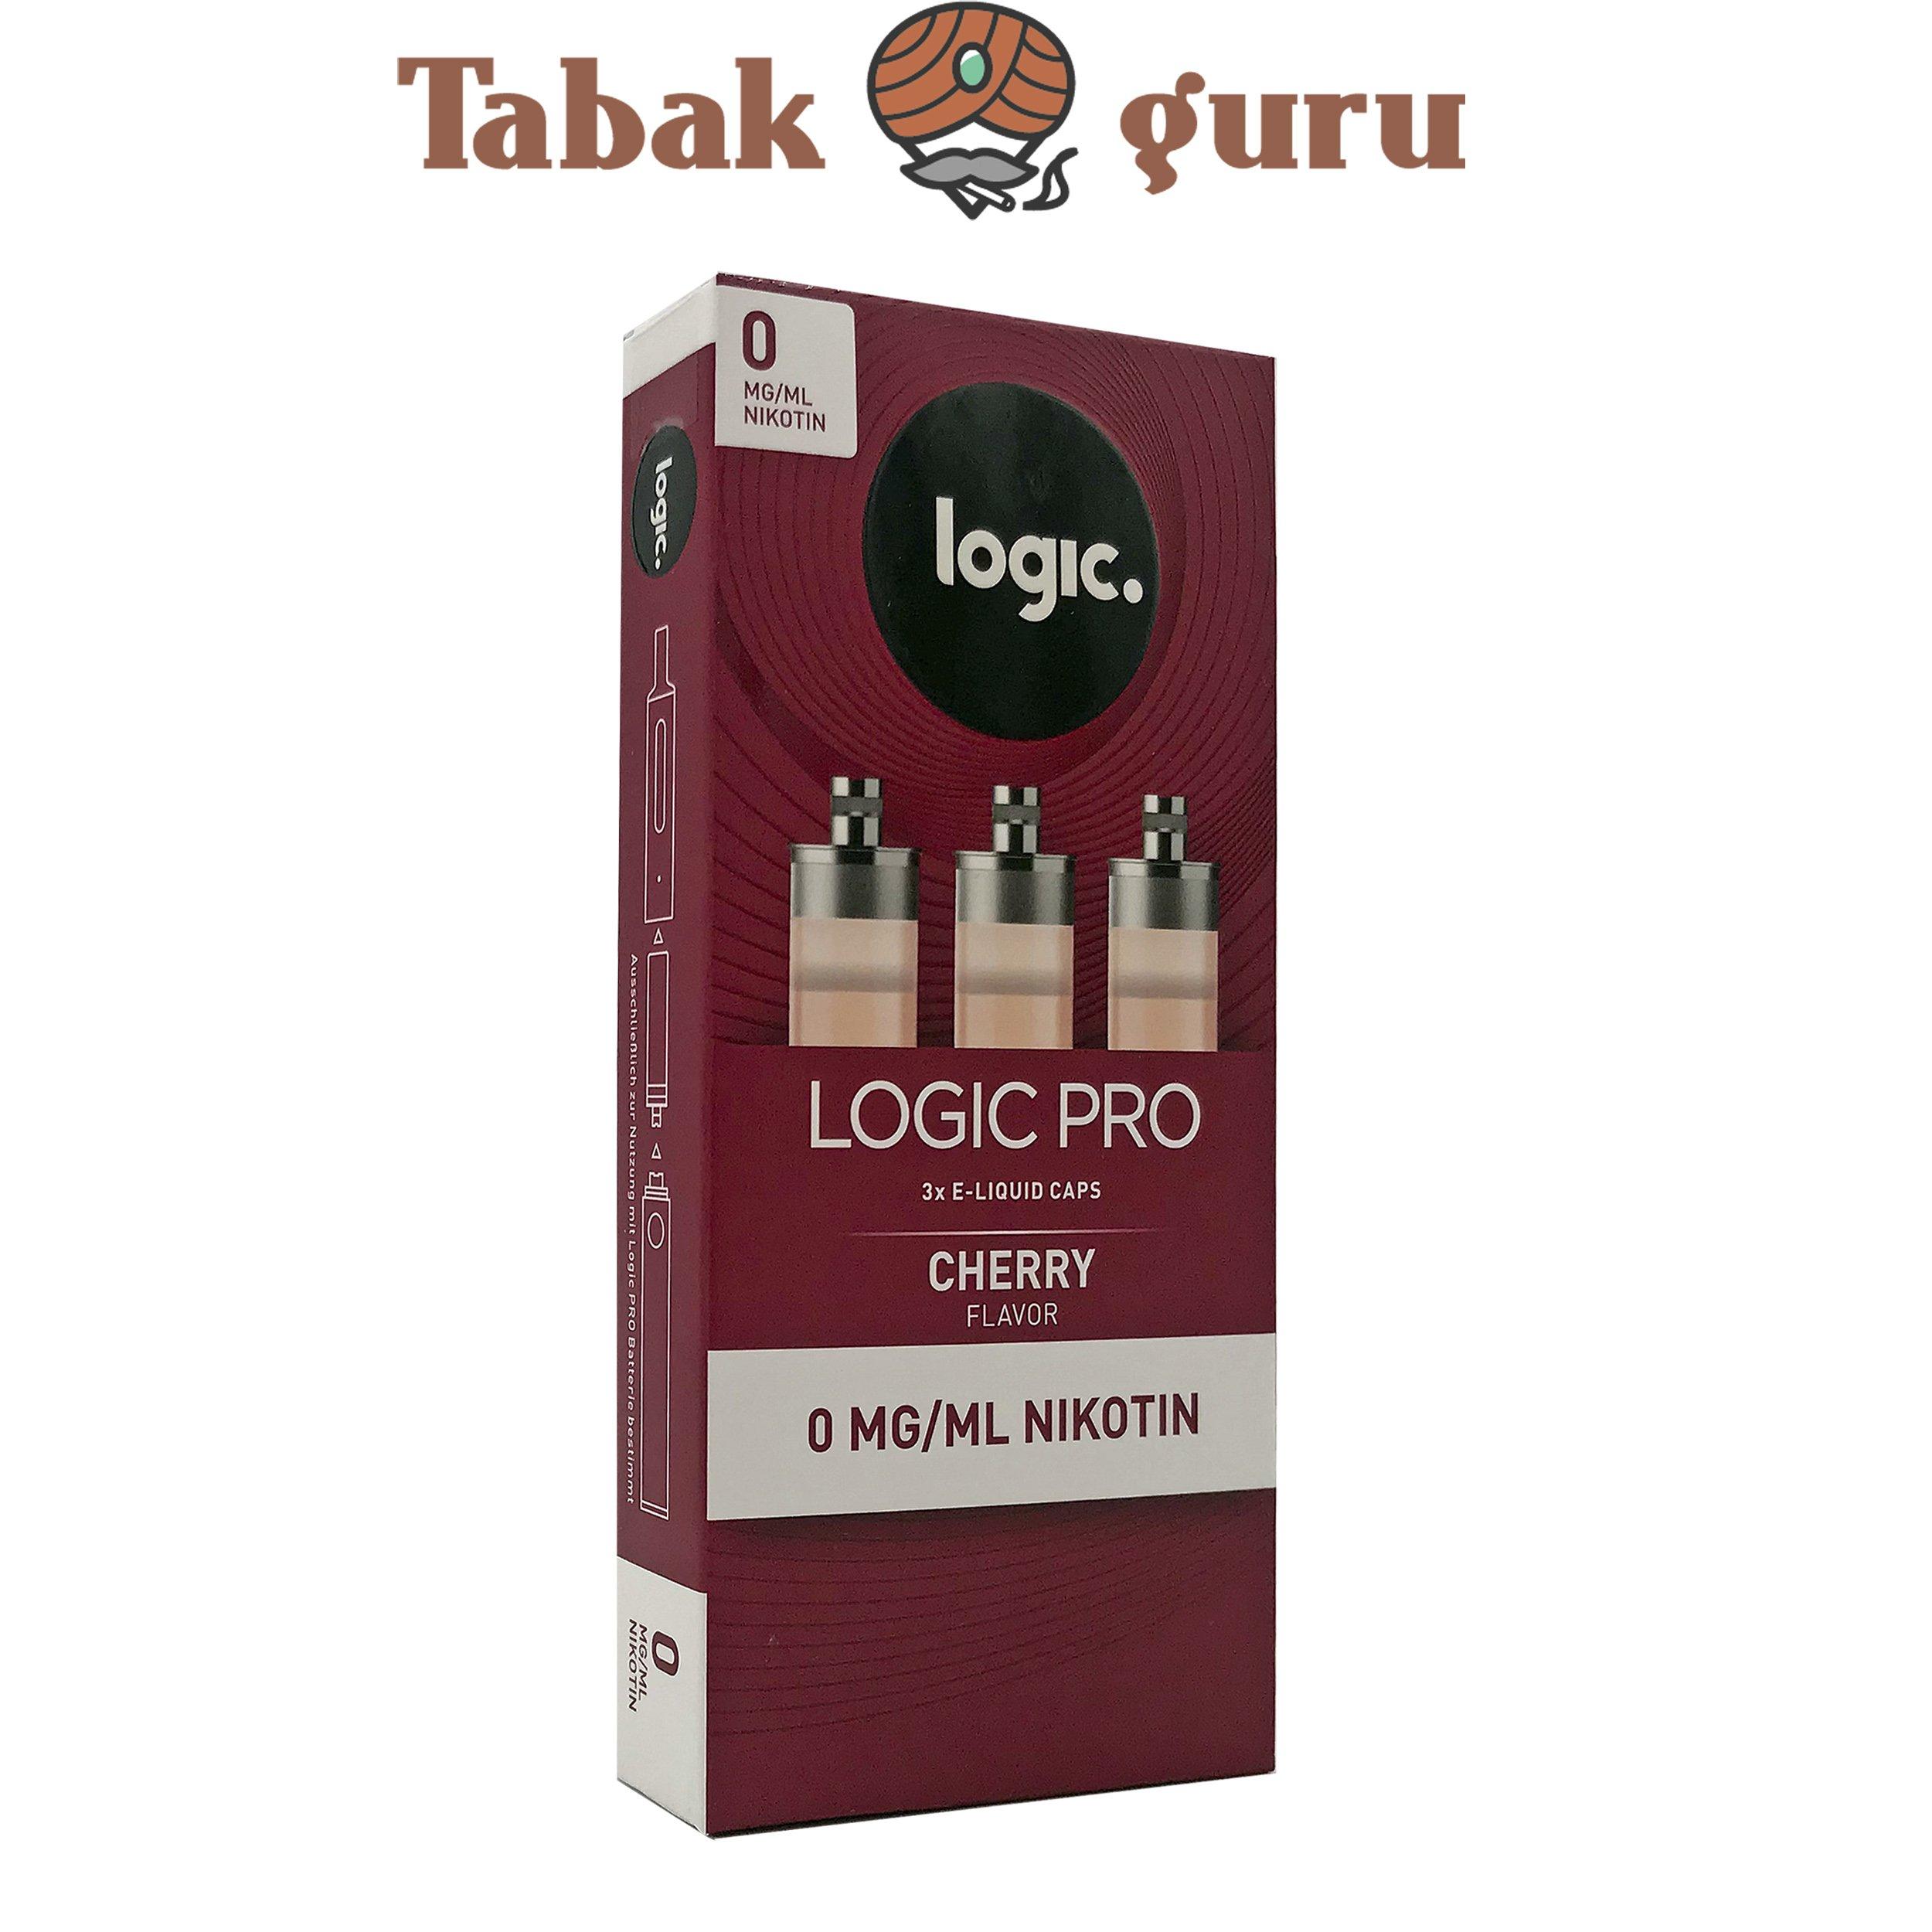 Logic Pro e-Liquid Caps Cherry Flavor 0 mg/ml Inhalt 3 Caps